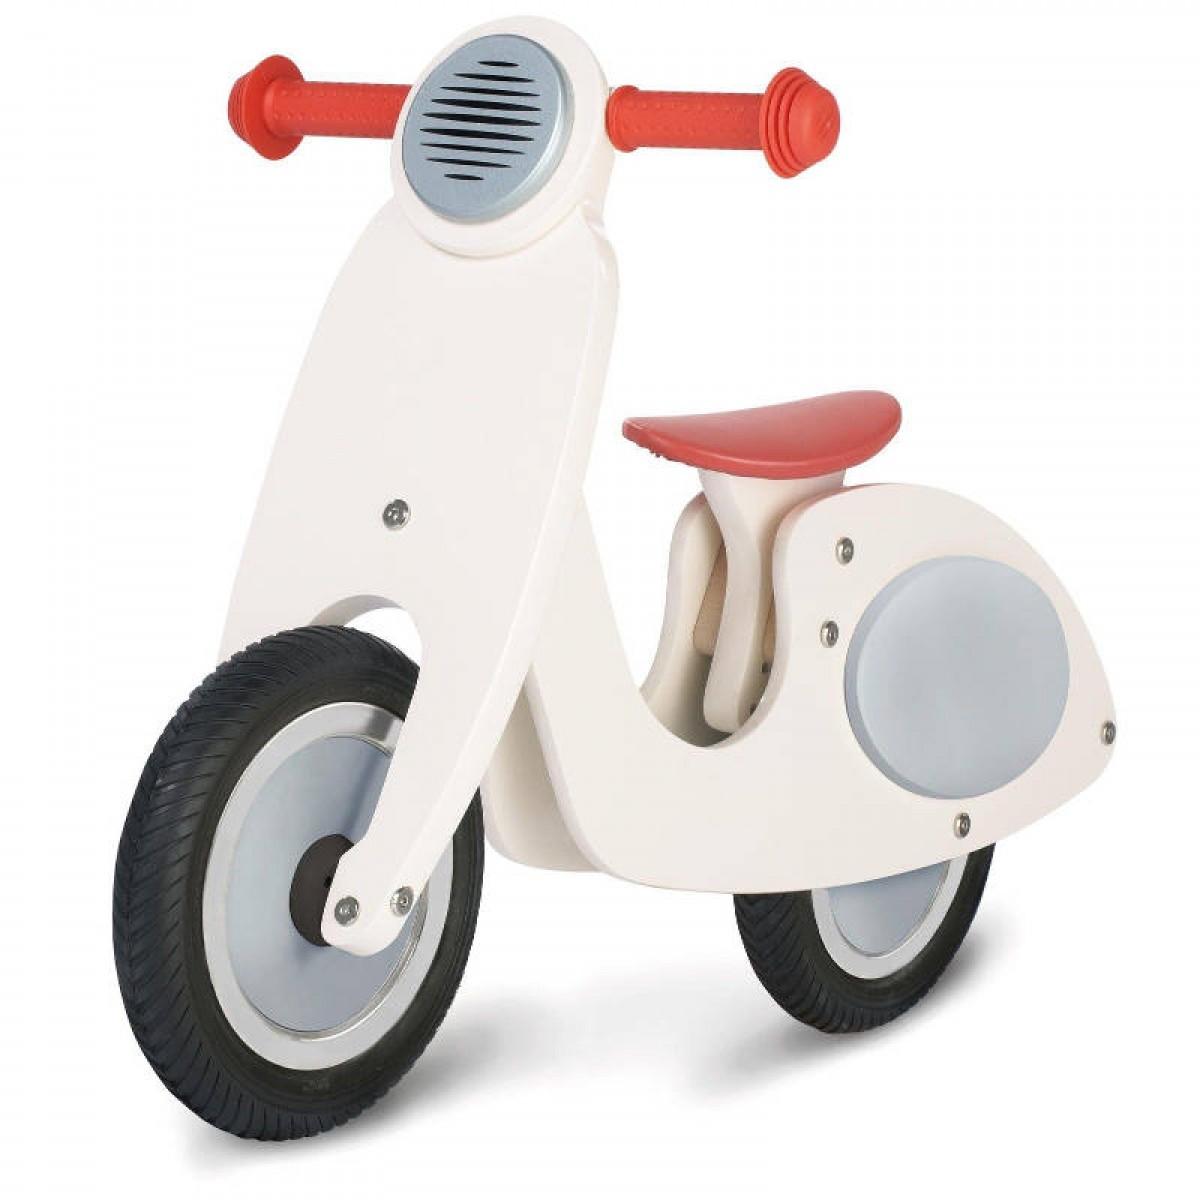 Kinderfahrzeuge Pinolino Laufrad Vespa Wanda 51cm weiß höhenverstellbar 239414